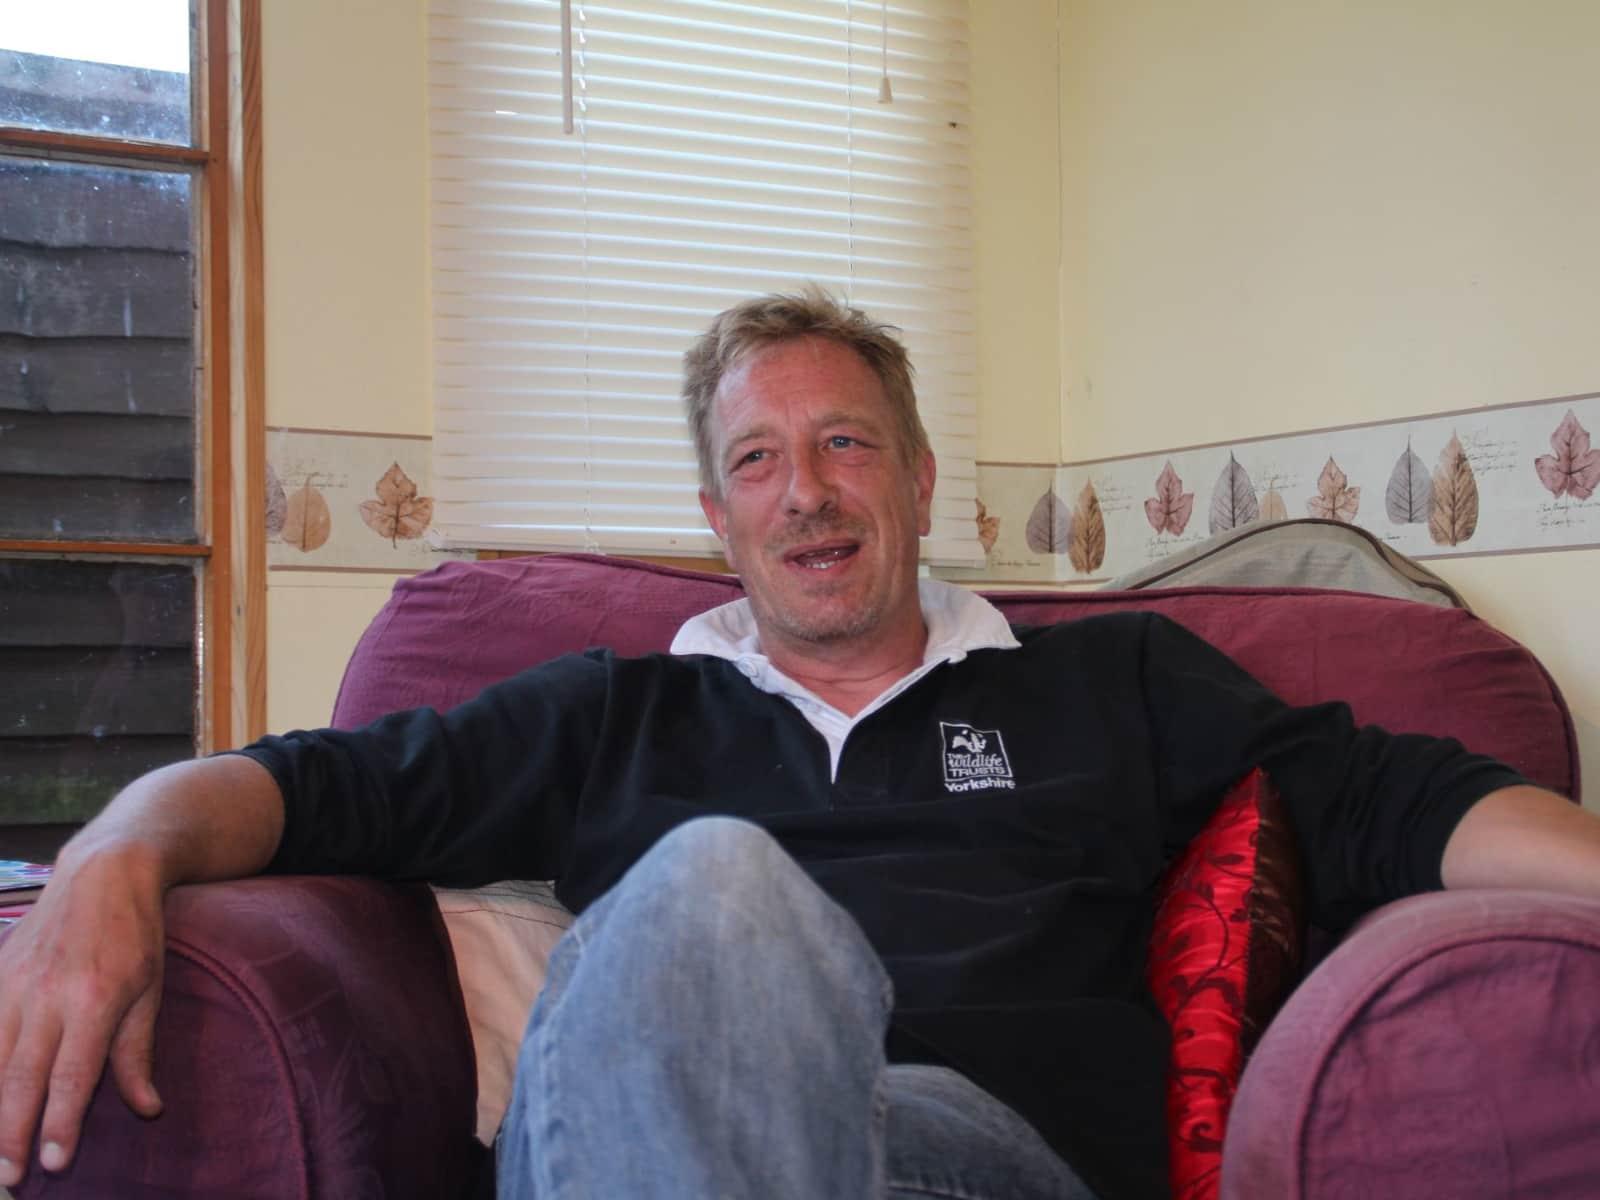 Tim from York, United Kingdom